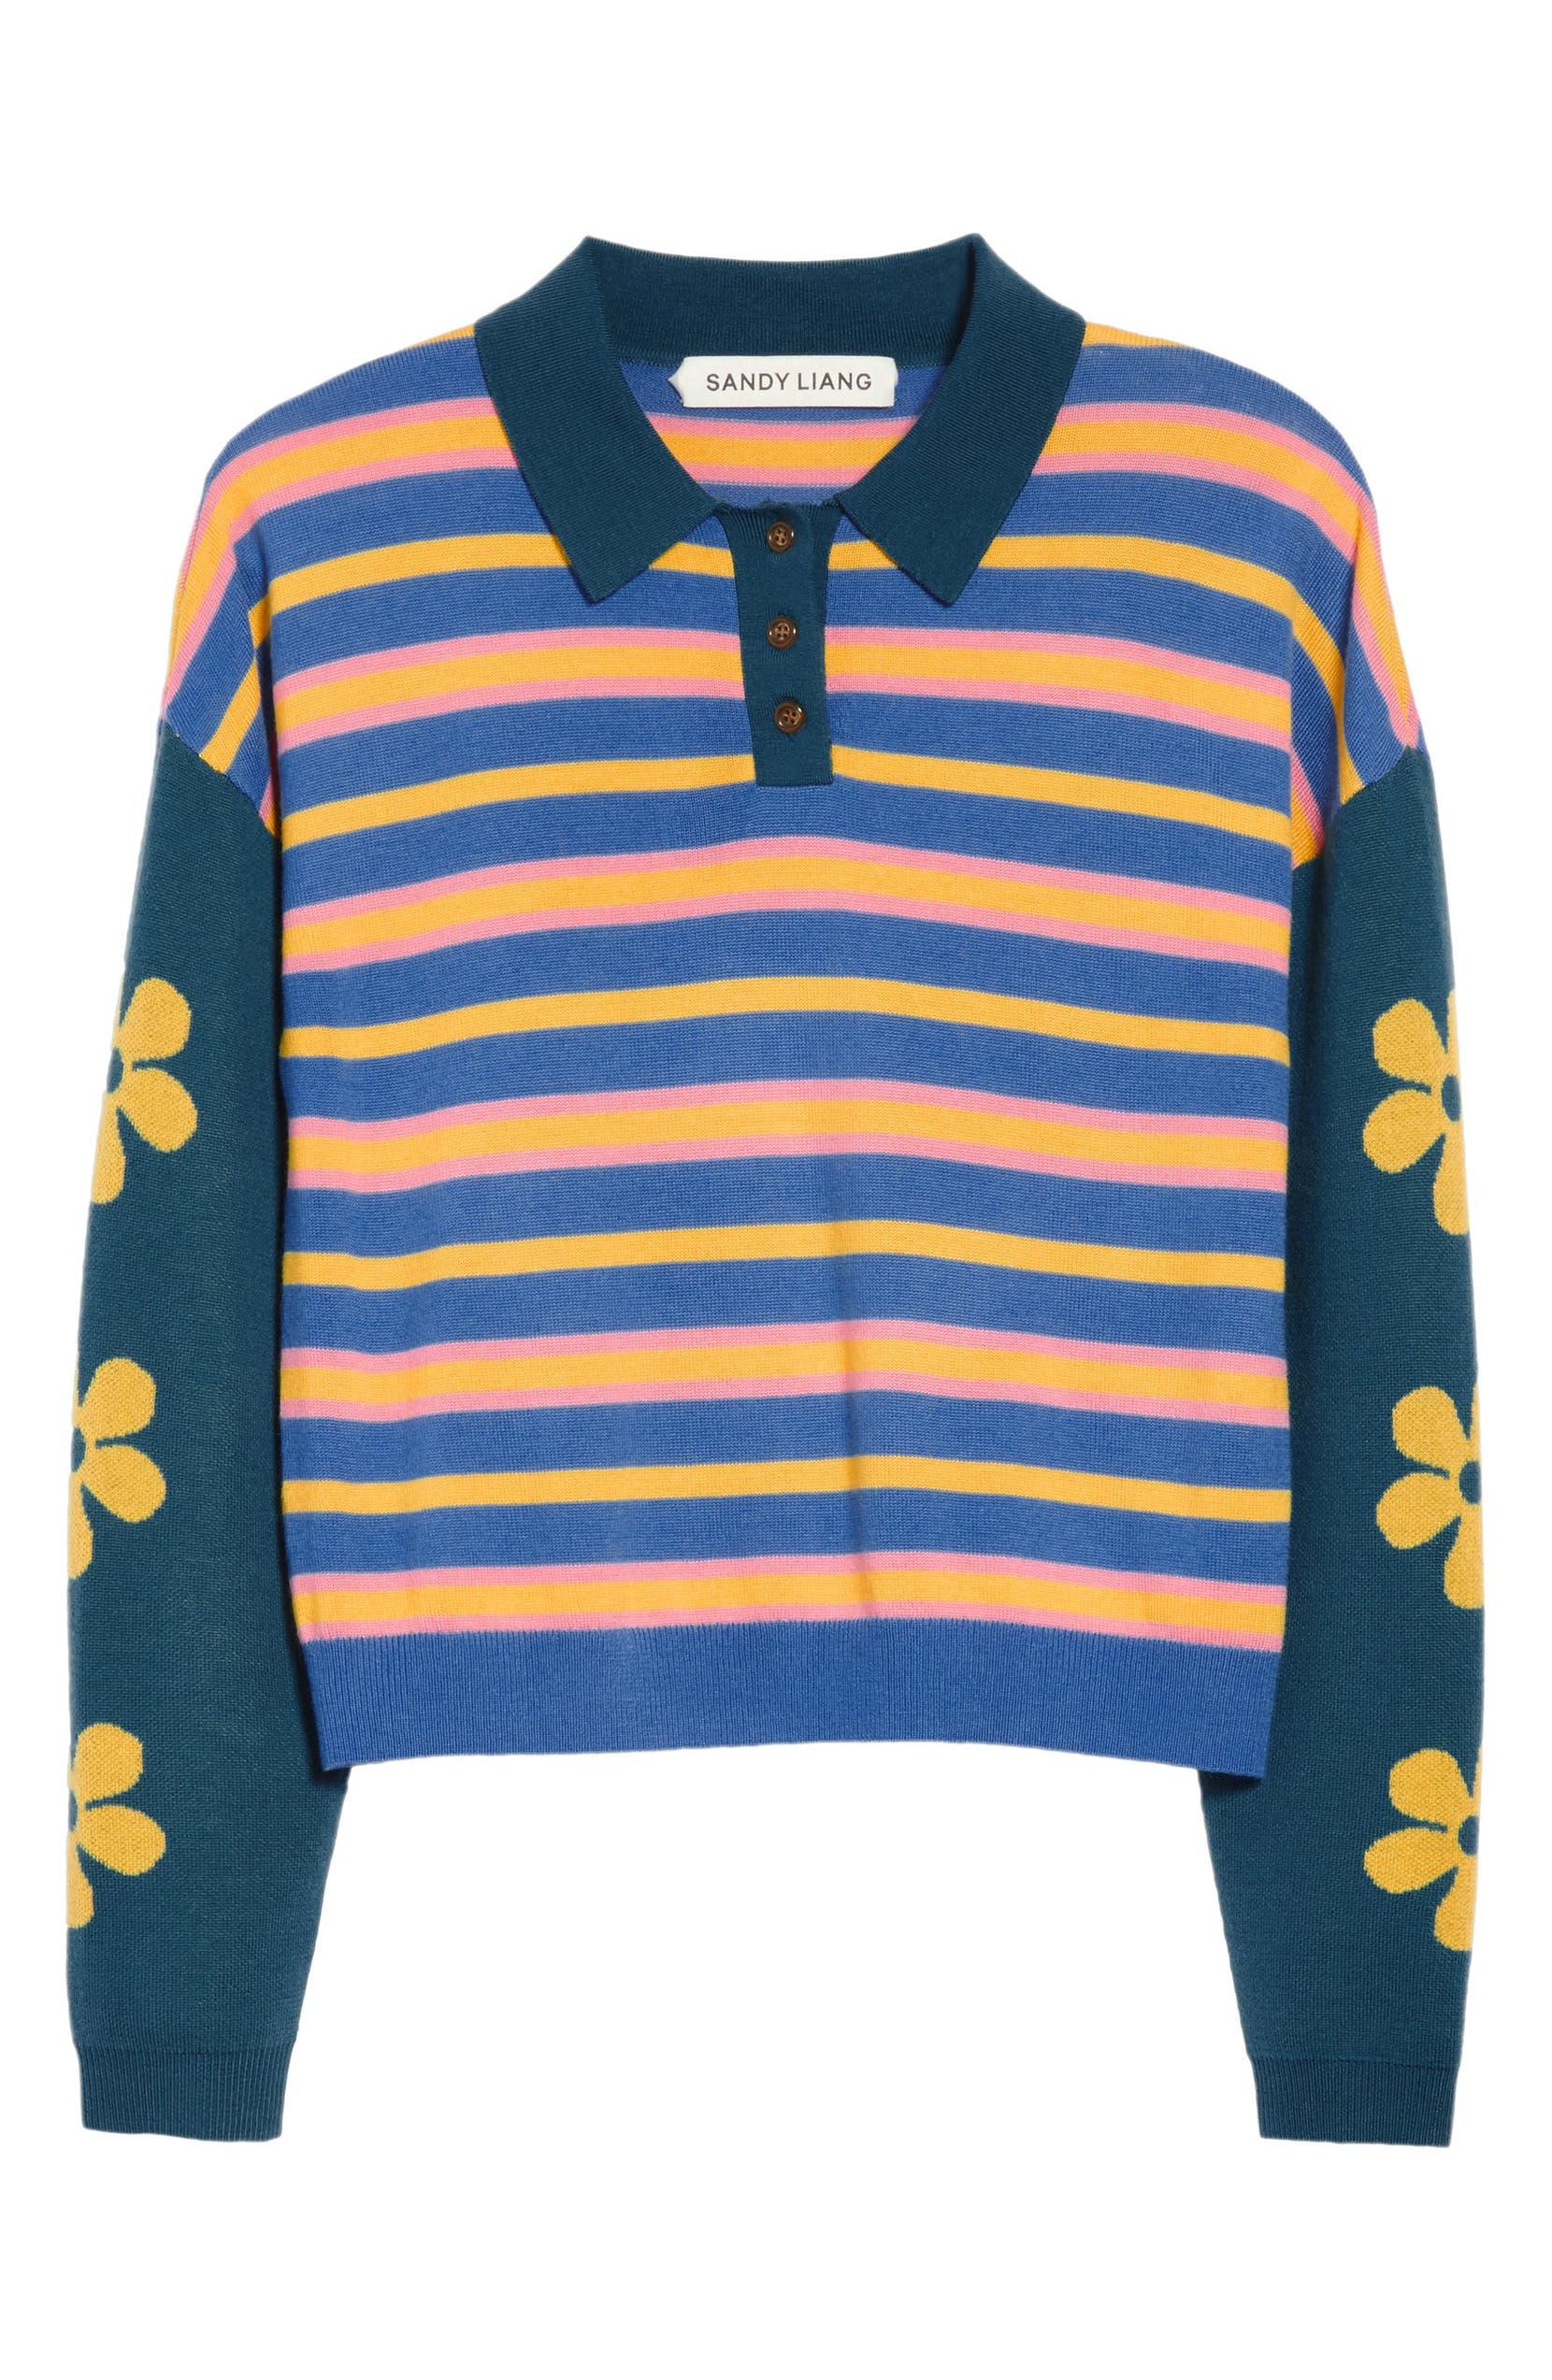 Sandy Liang Spongebob Polo Sweater Nordstrom